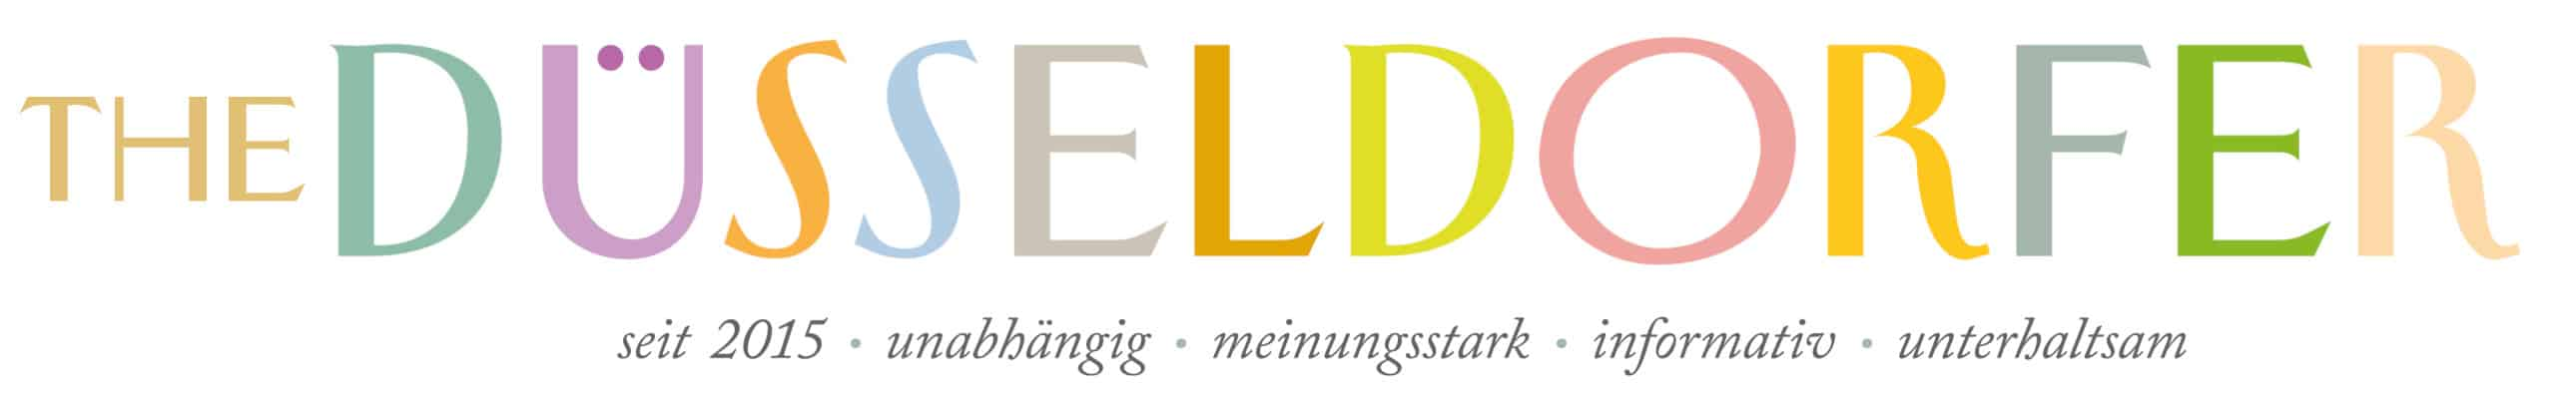 The Düsseldorfer – das lokale Online-Magazin